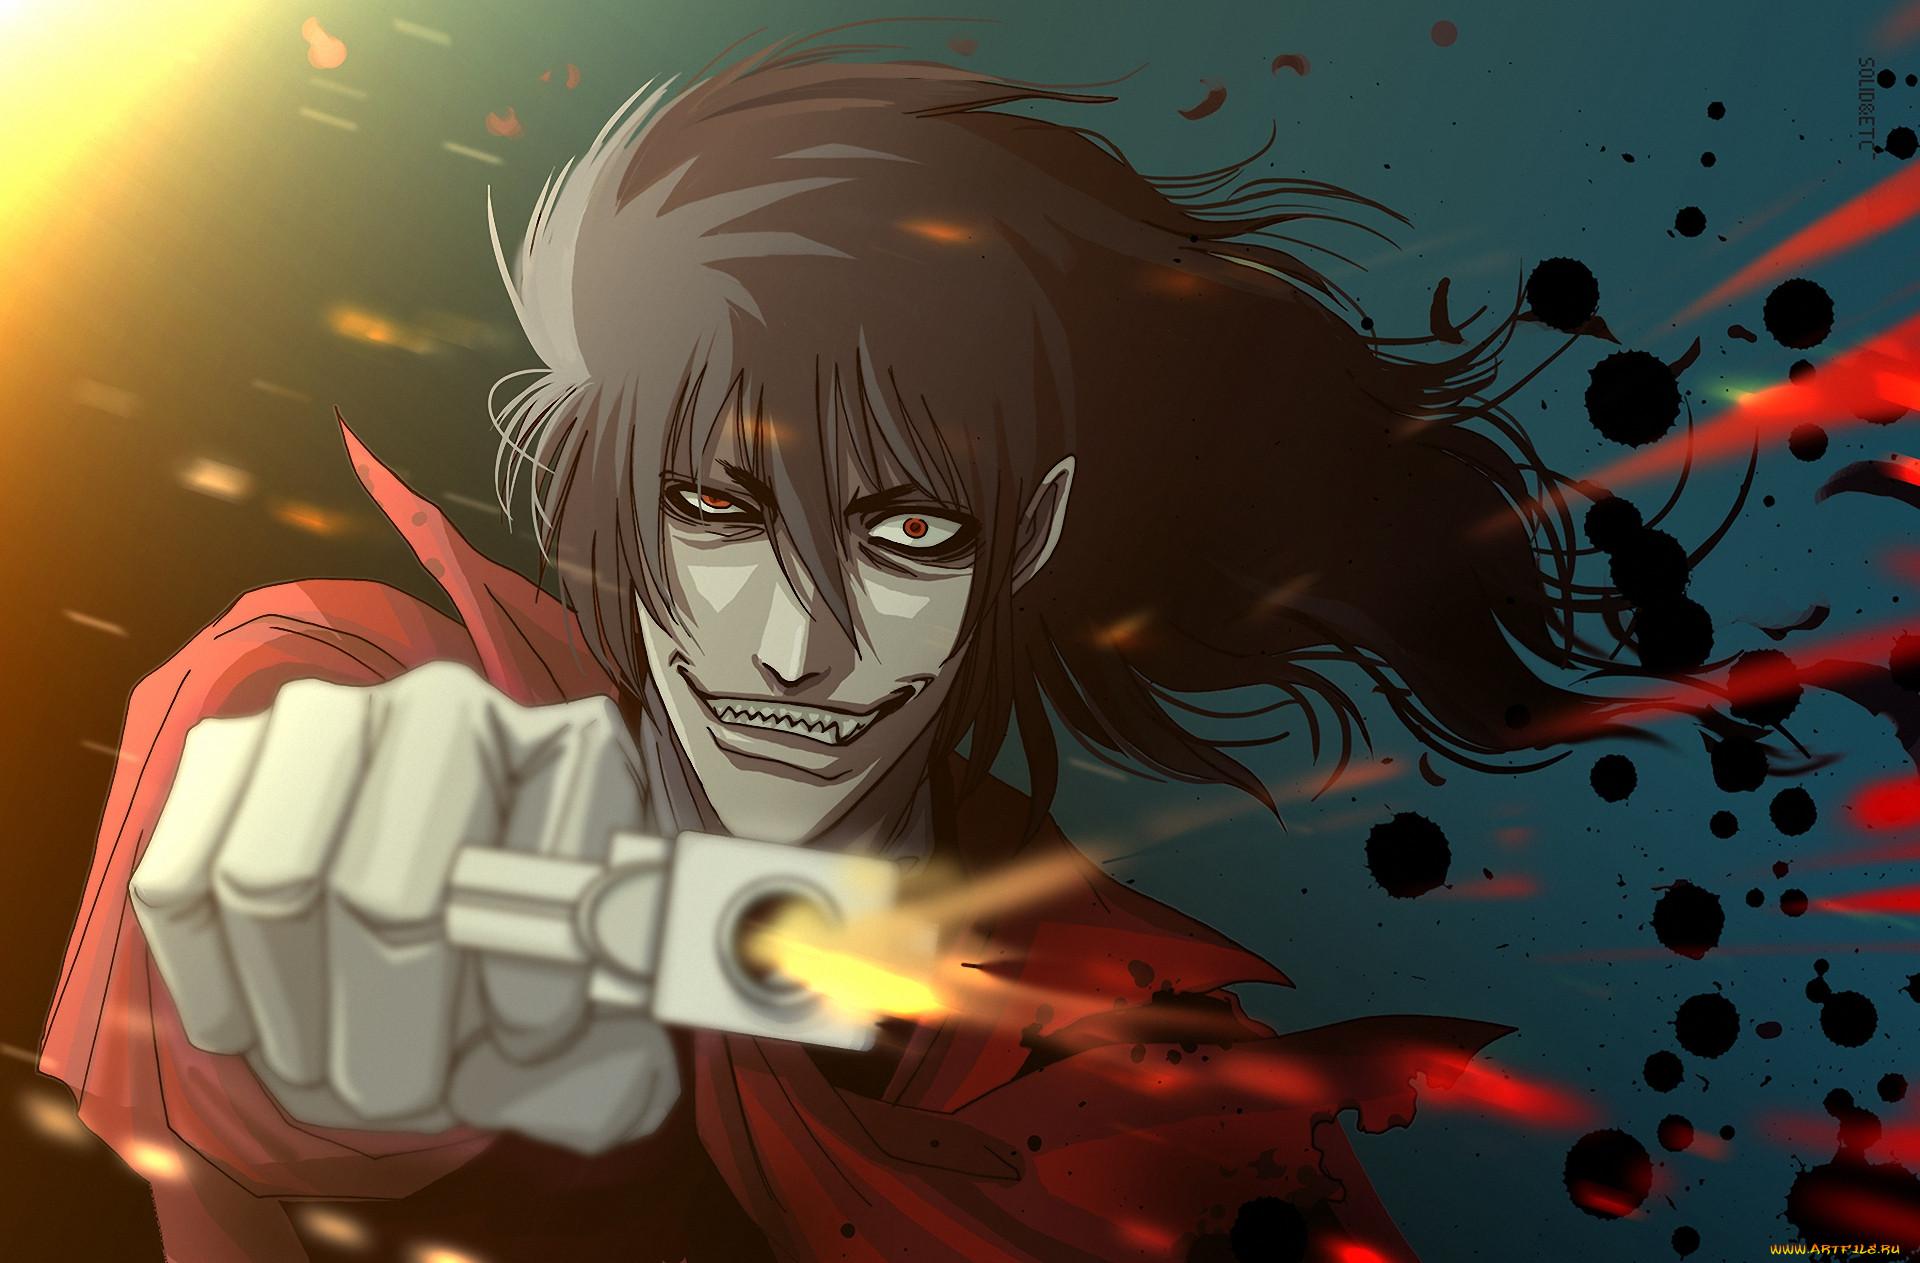 аниме, hellsing, dracula, vampire, alucard, дракула, вампир, взгляд, алукард, выстрел, пистолет